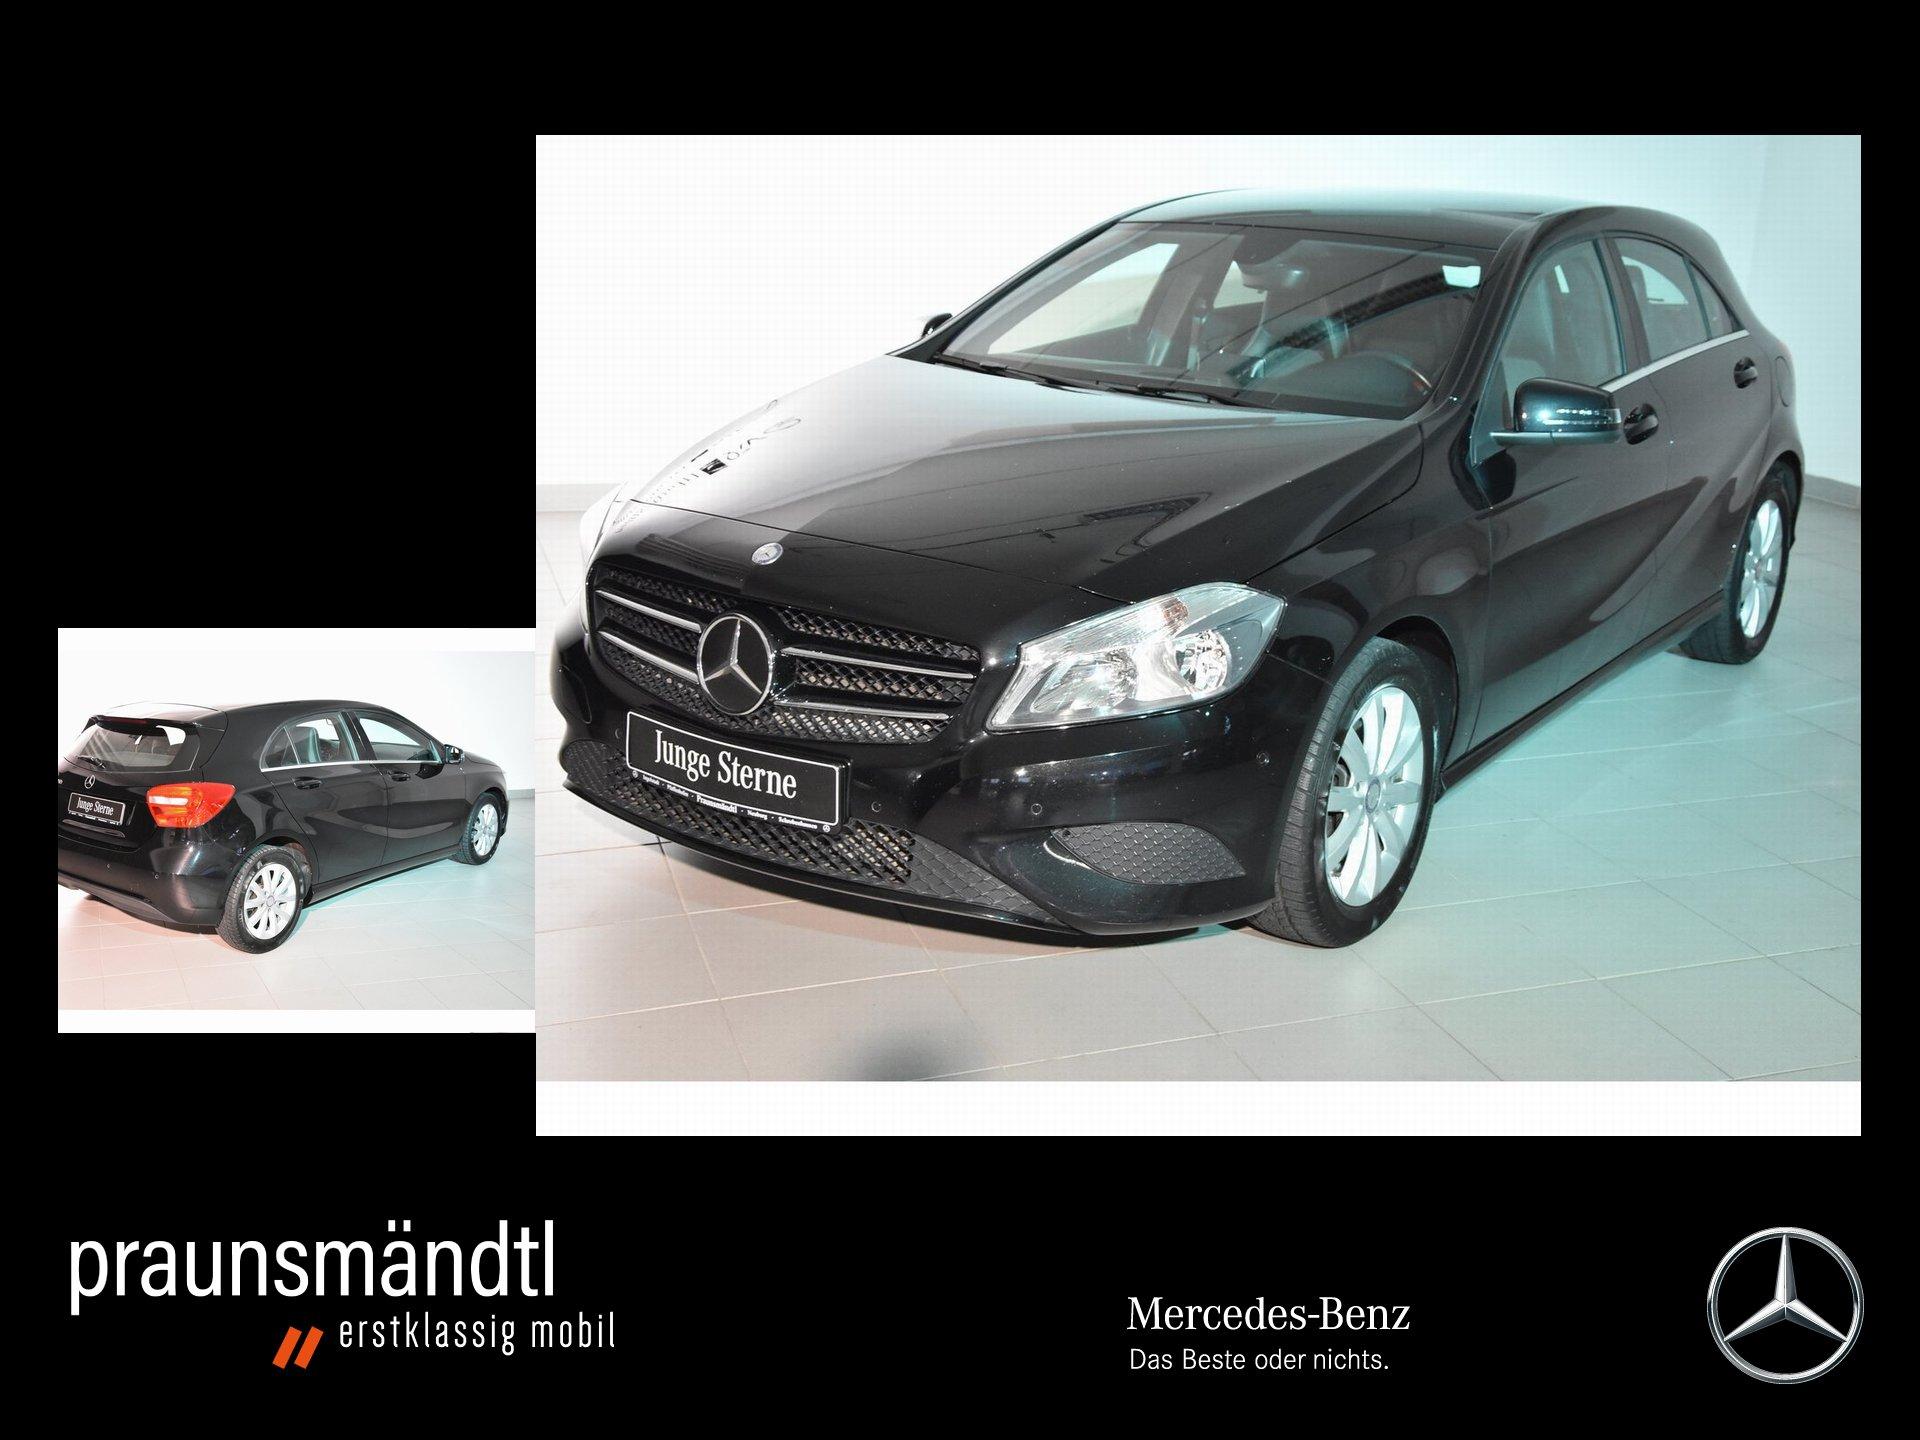 Mercedes-Benz A 180 Style NAVI/Park-Pilot/SHZ/LMR 16 Zo/Klima, Jahr 2013, Benzin